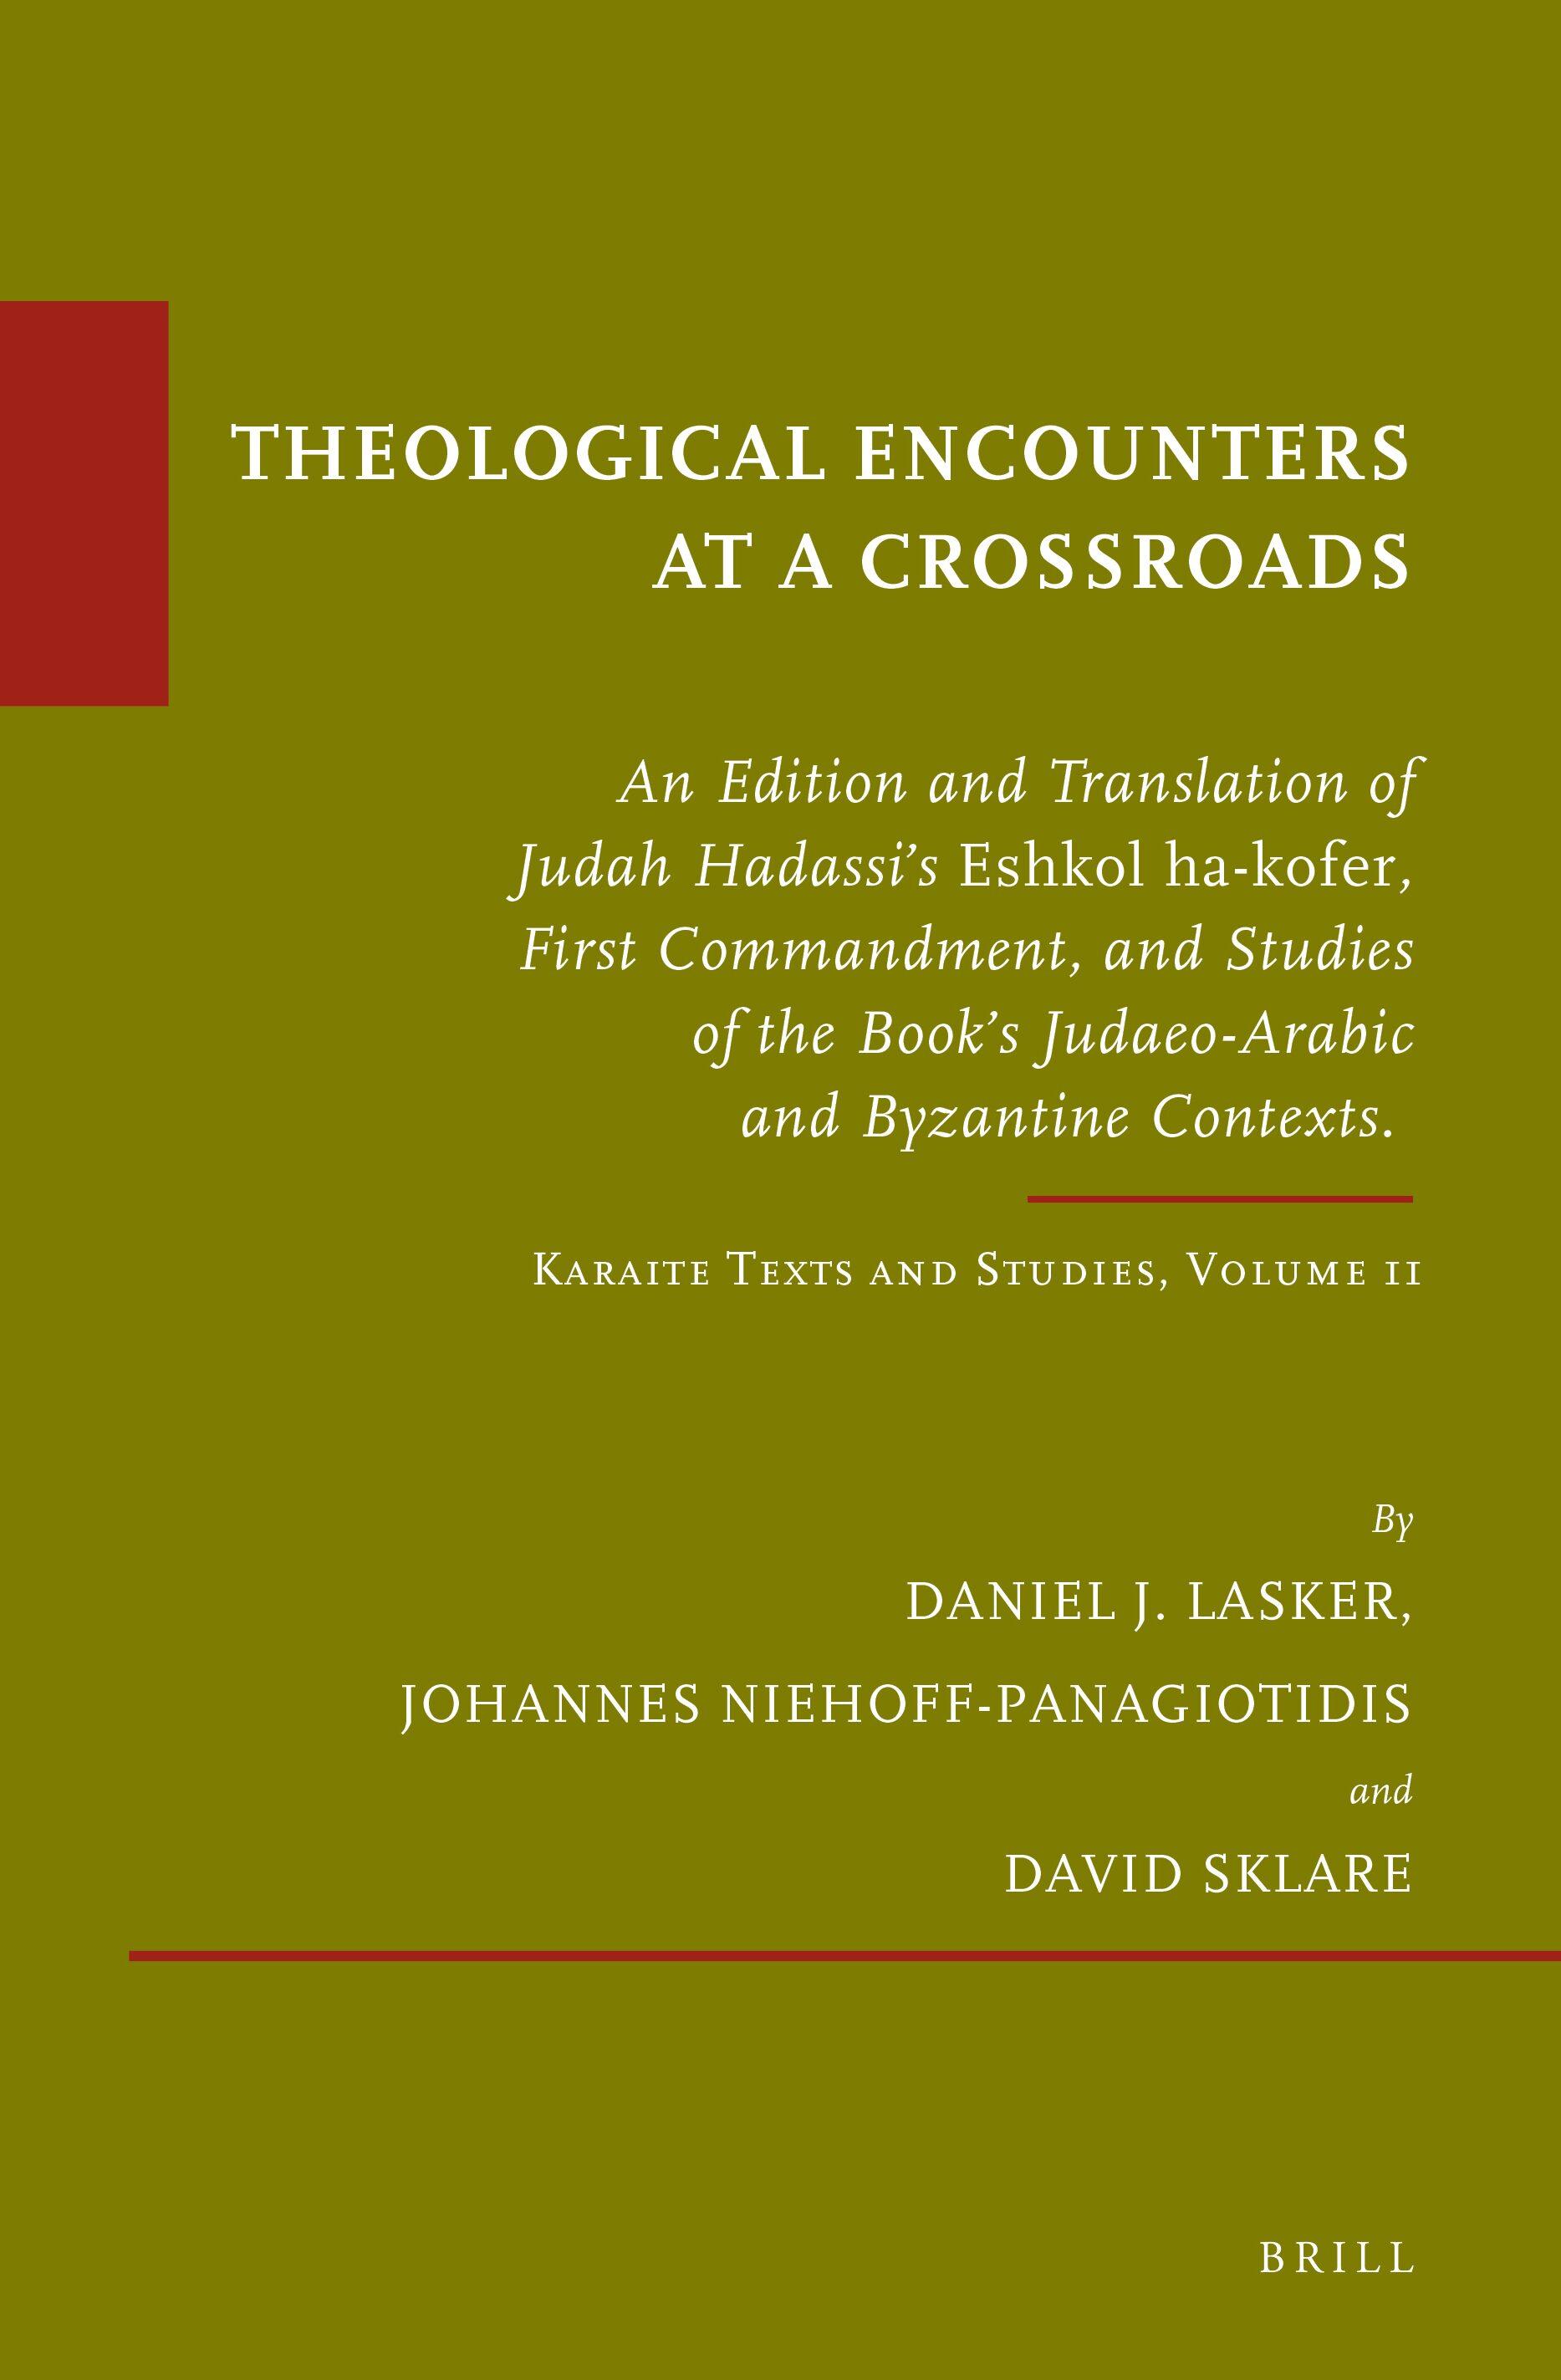 Judah Hadassi And The Greek Language In Twelfth Century